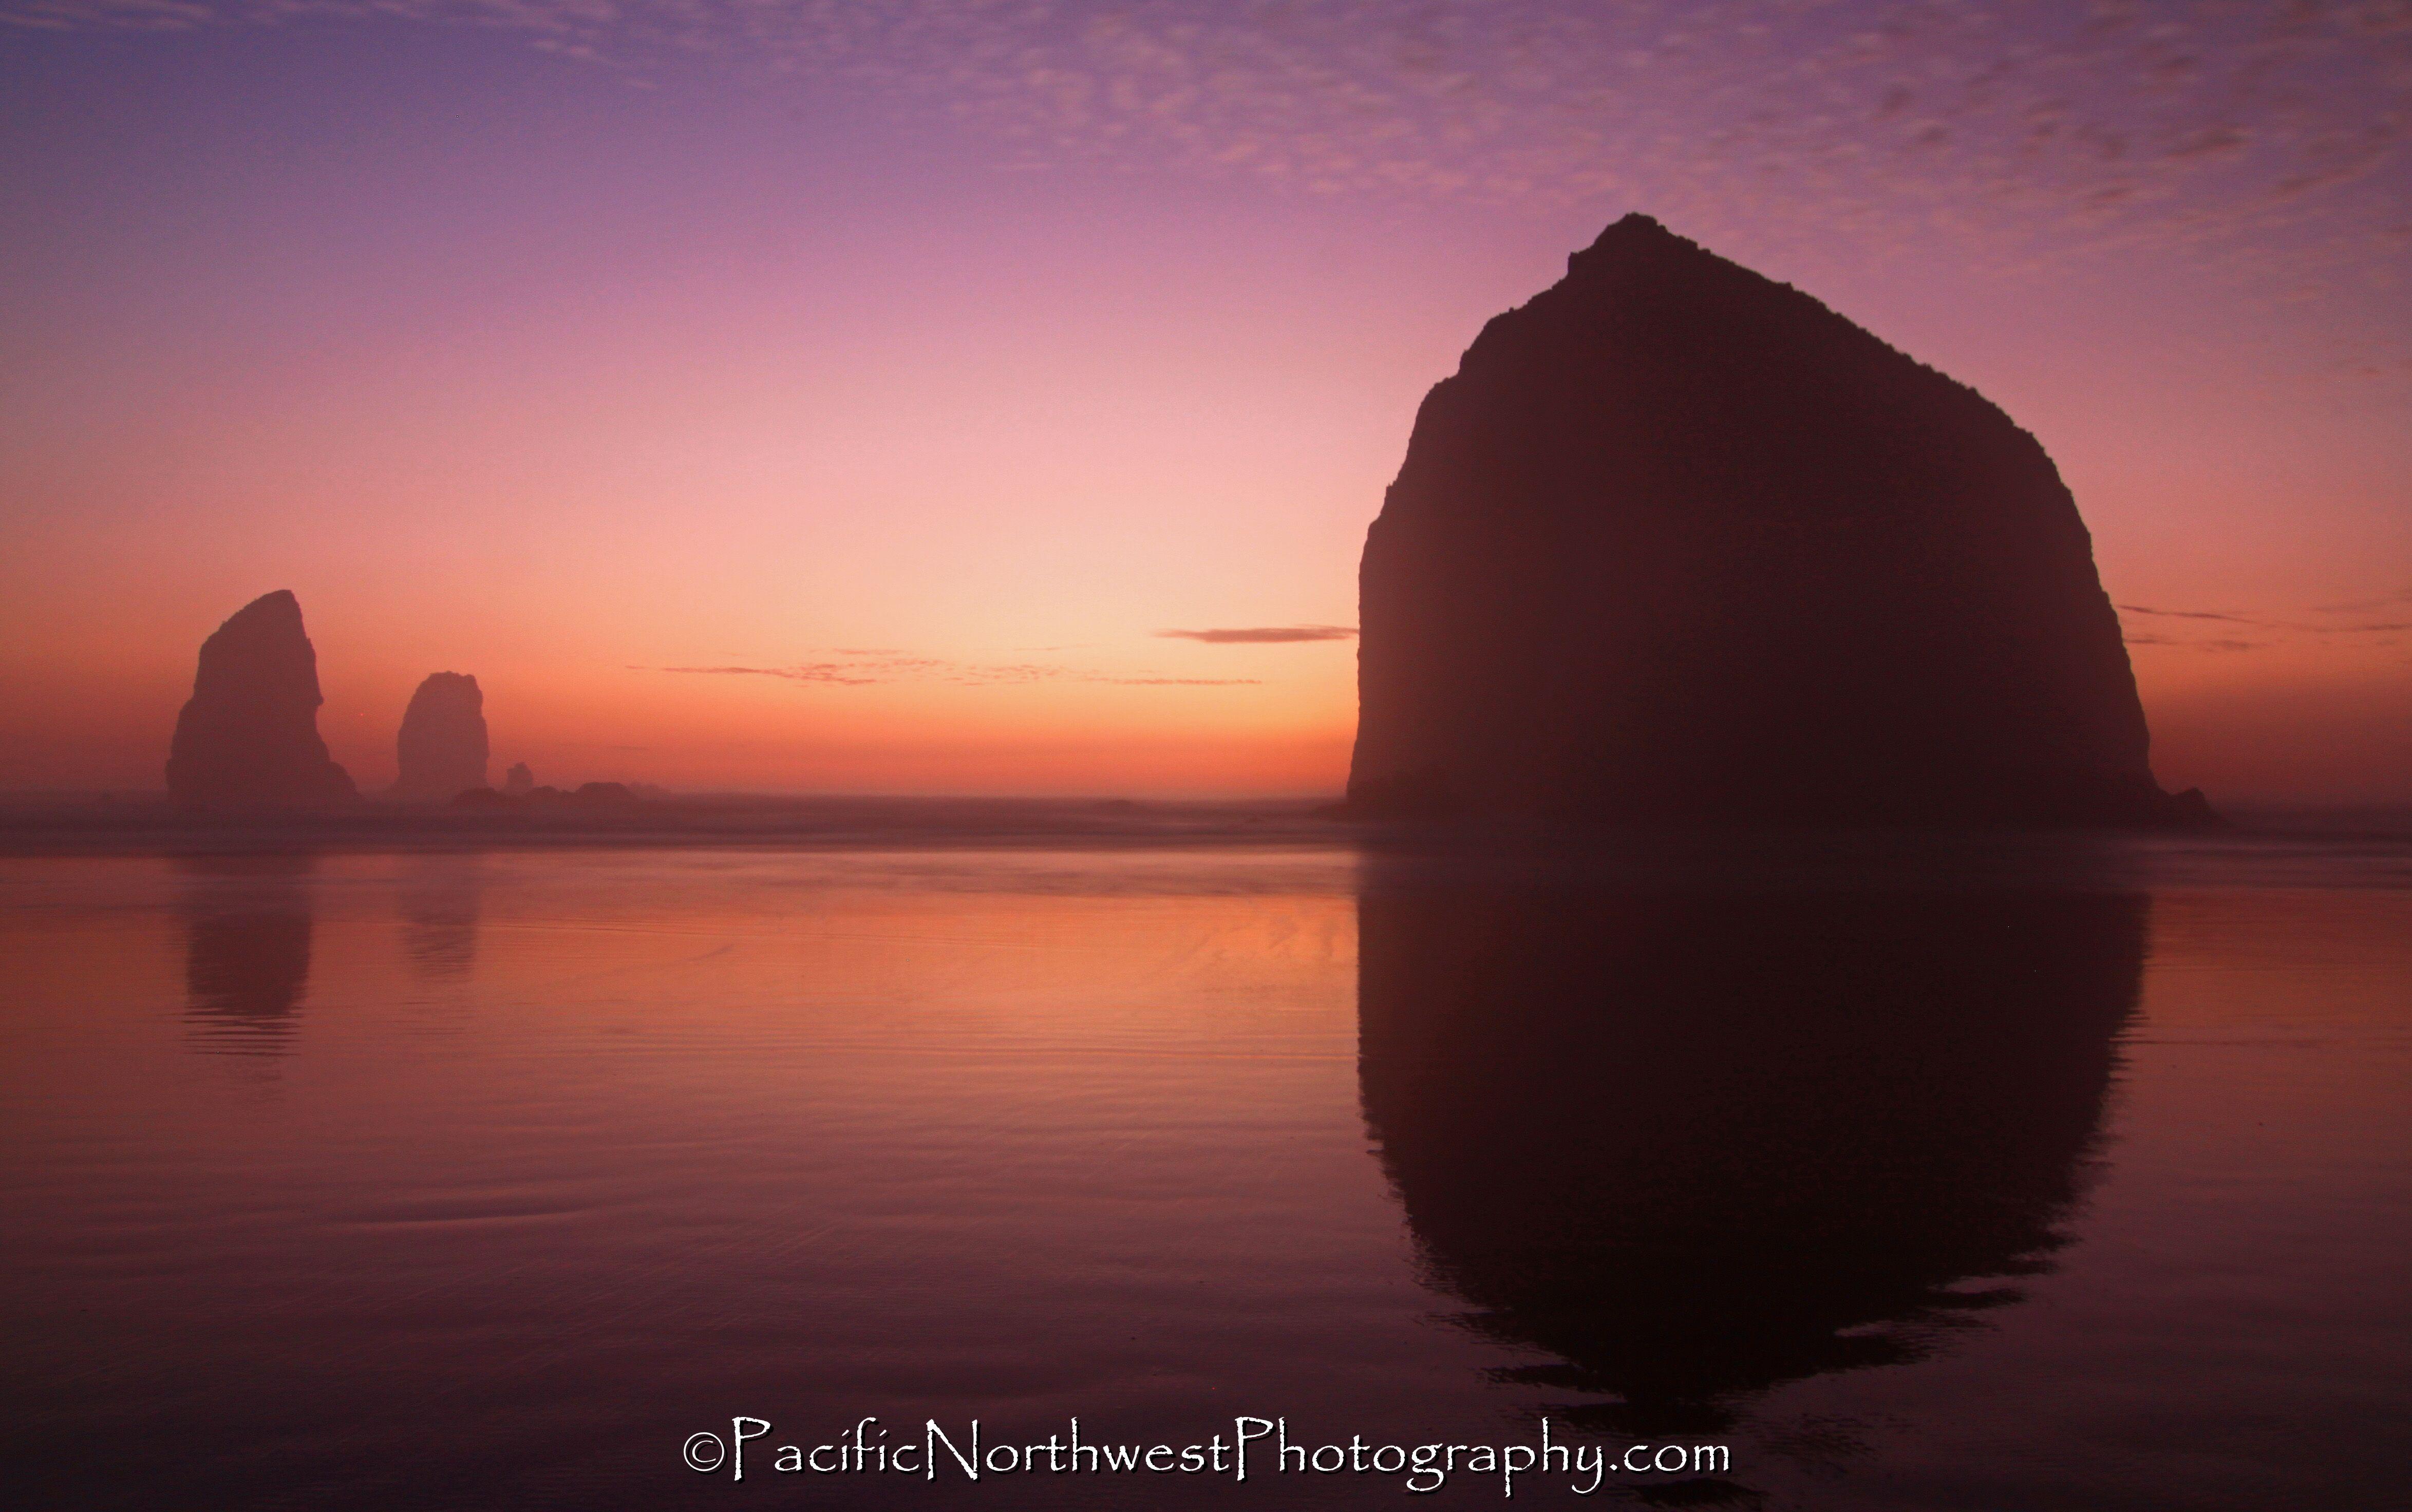 Sunset at the Oregon Coast